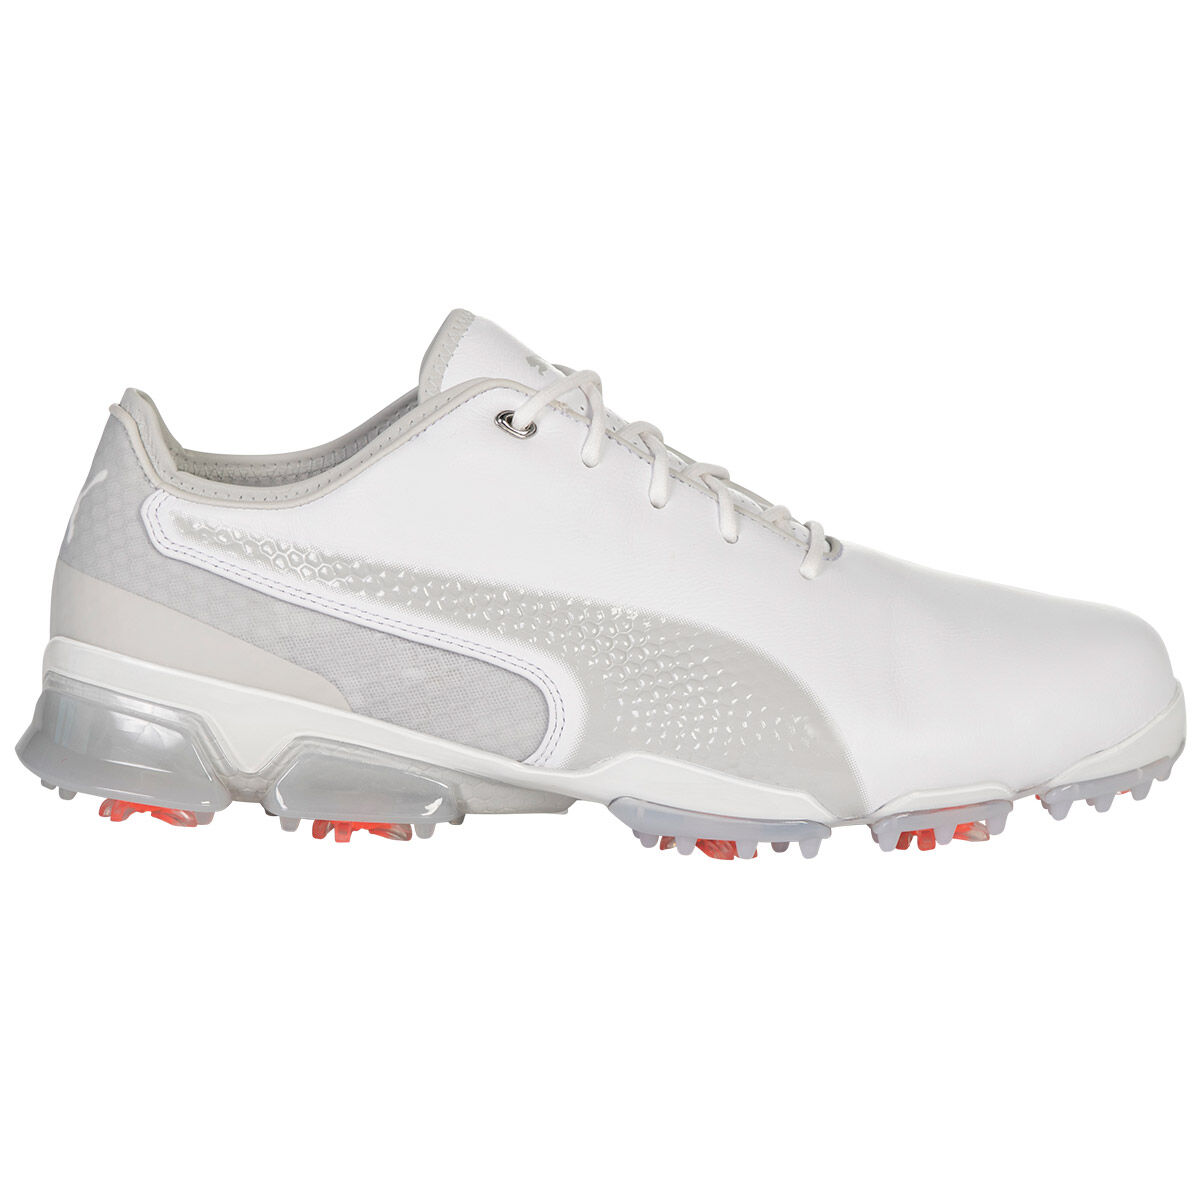 PUMA Golf IGNITE PROADAPT Shoes from